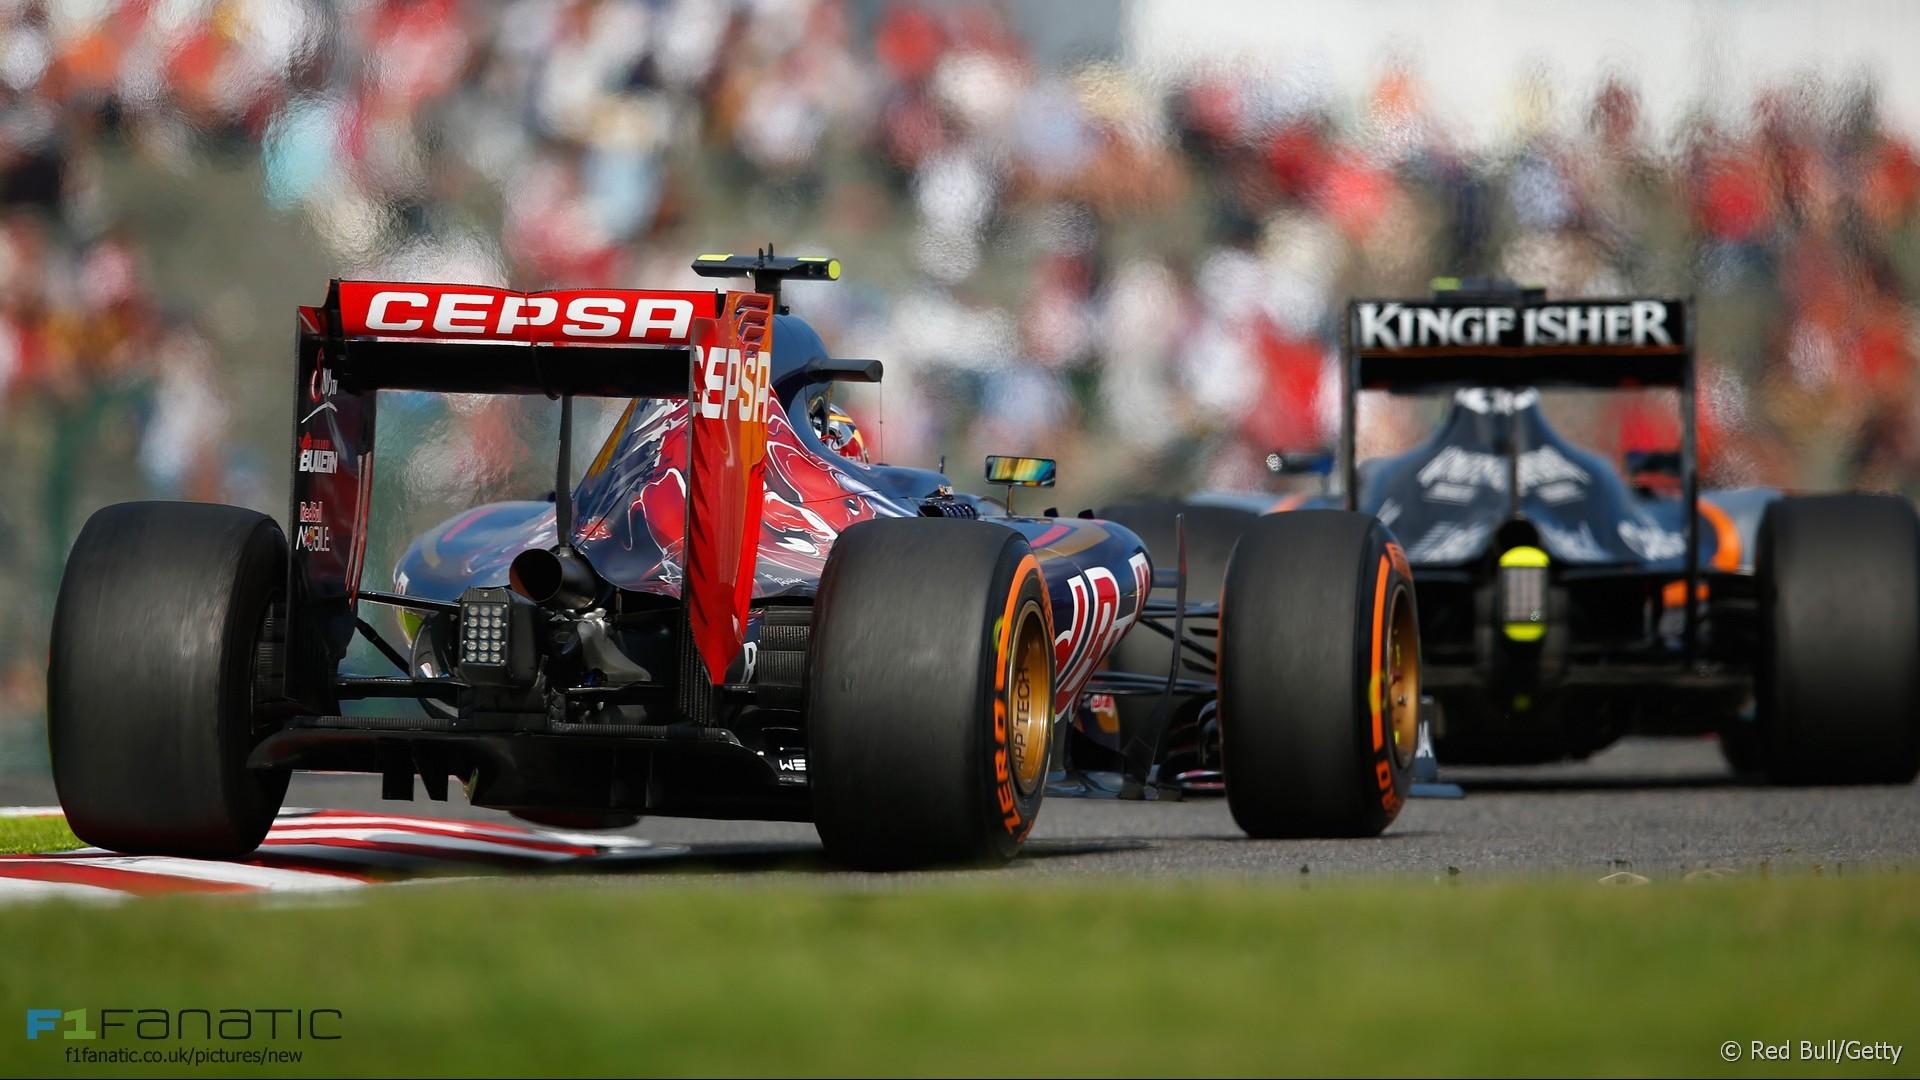 Carlos Sainz Jnr, Toro Rosso, Suzuka, 2015